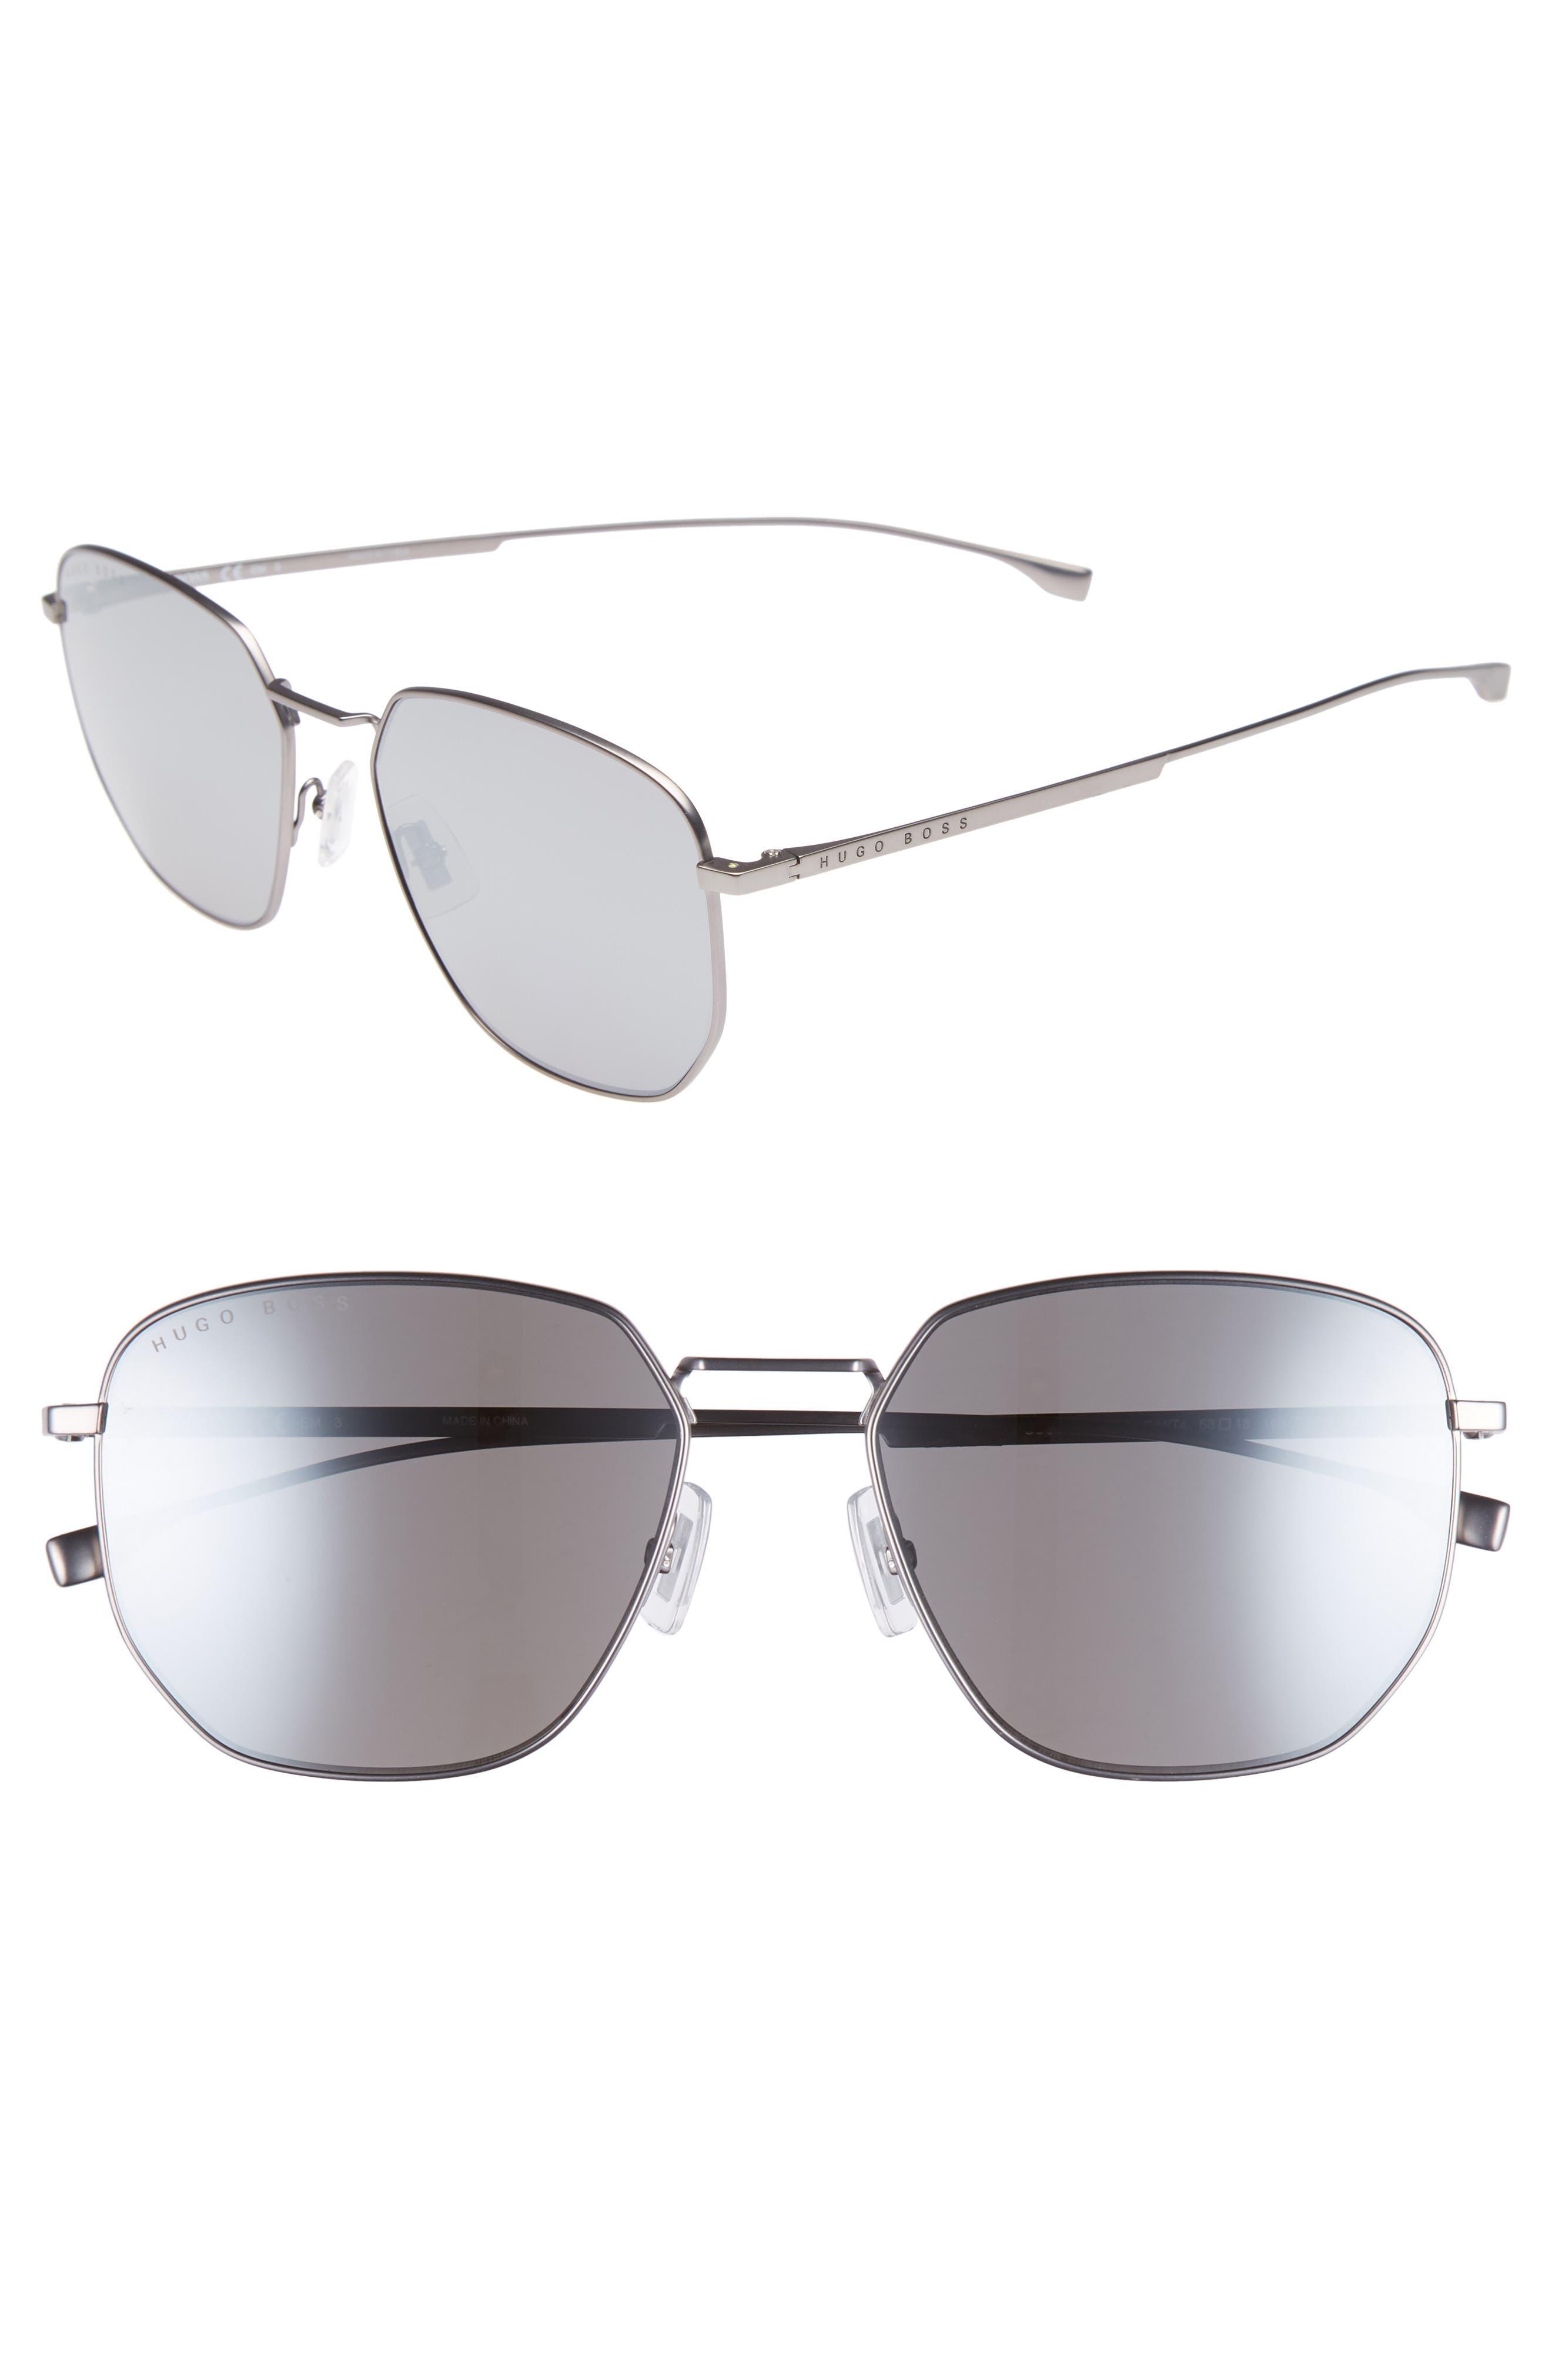 Special Fit 58mm Polarized Titanium Aviator Sunglasses,                         Main,                         color, MATTE GREY